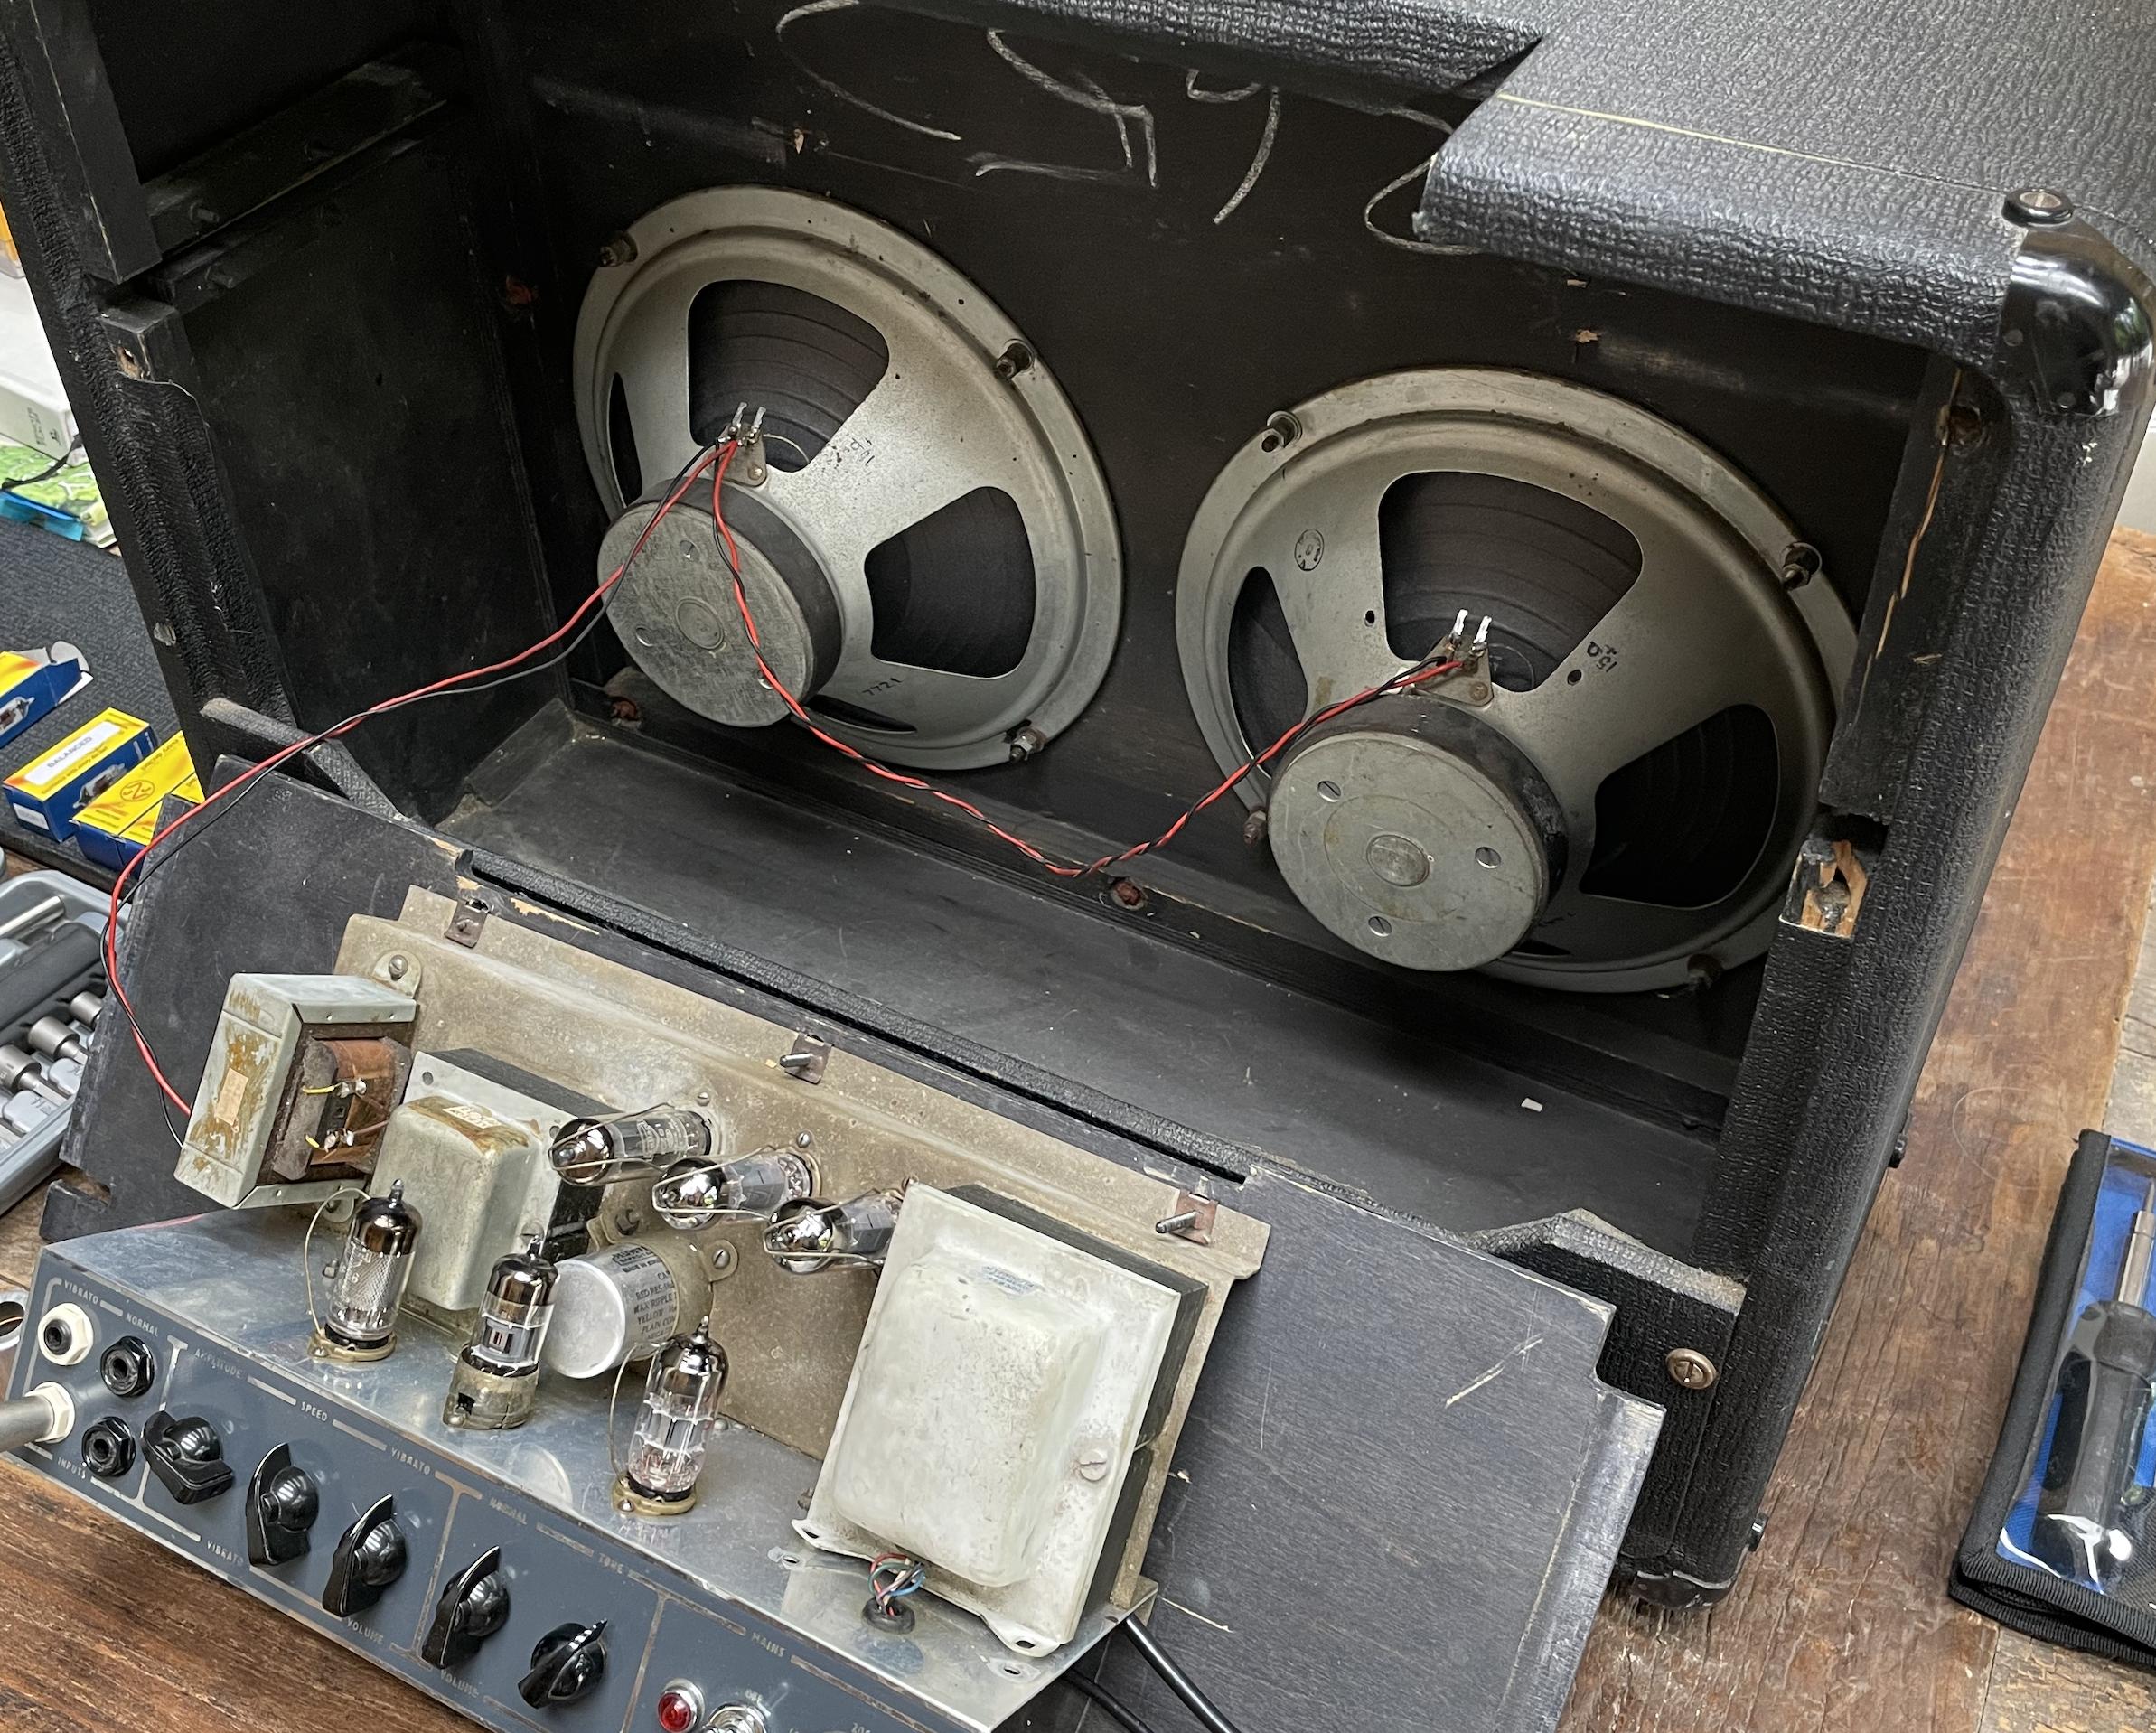 Valves for Vox AC10 Amplifier